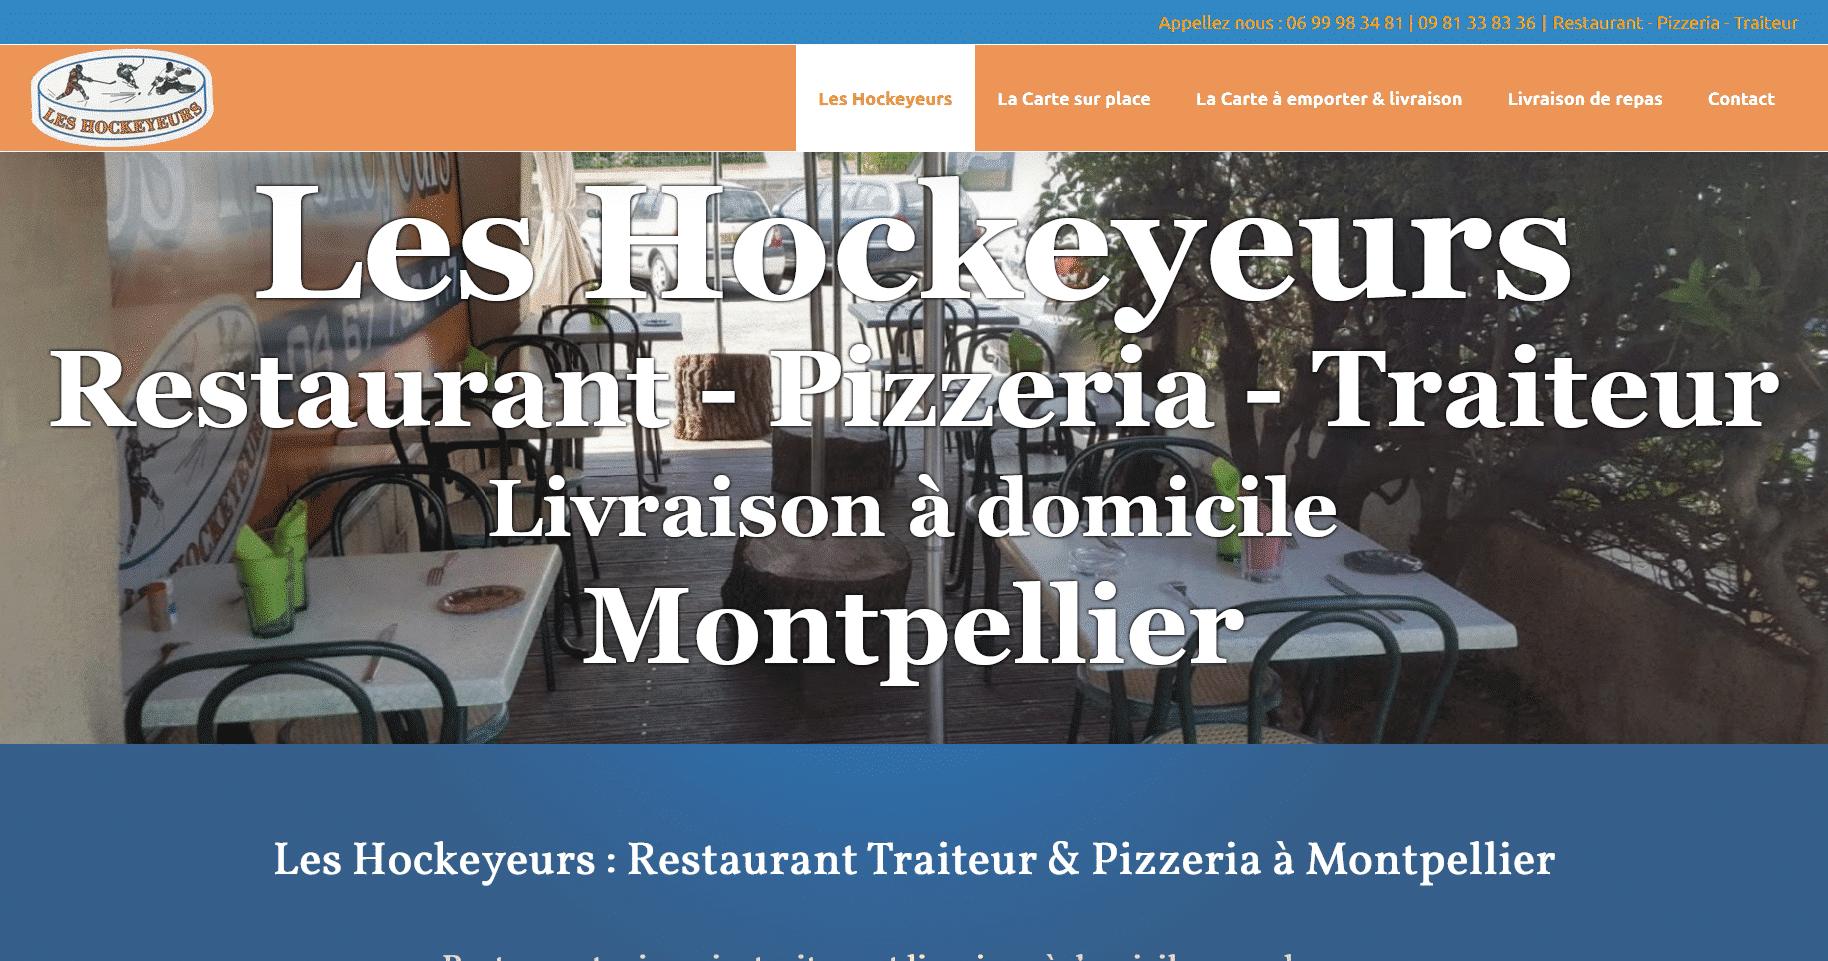 Les Hockeyeurs Restaurant